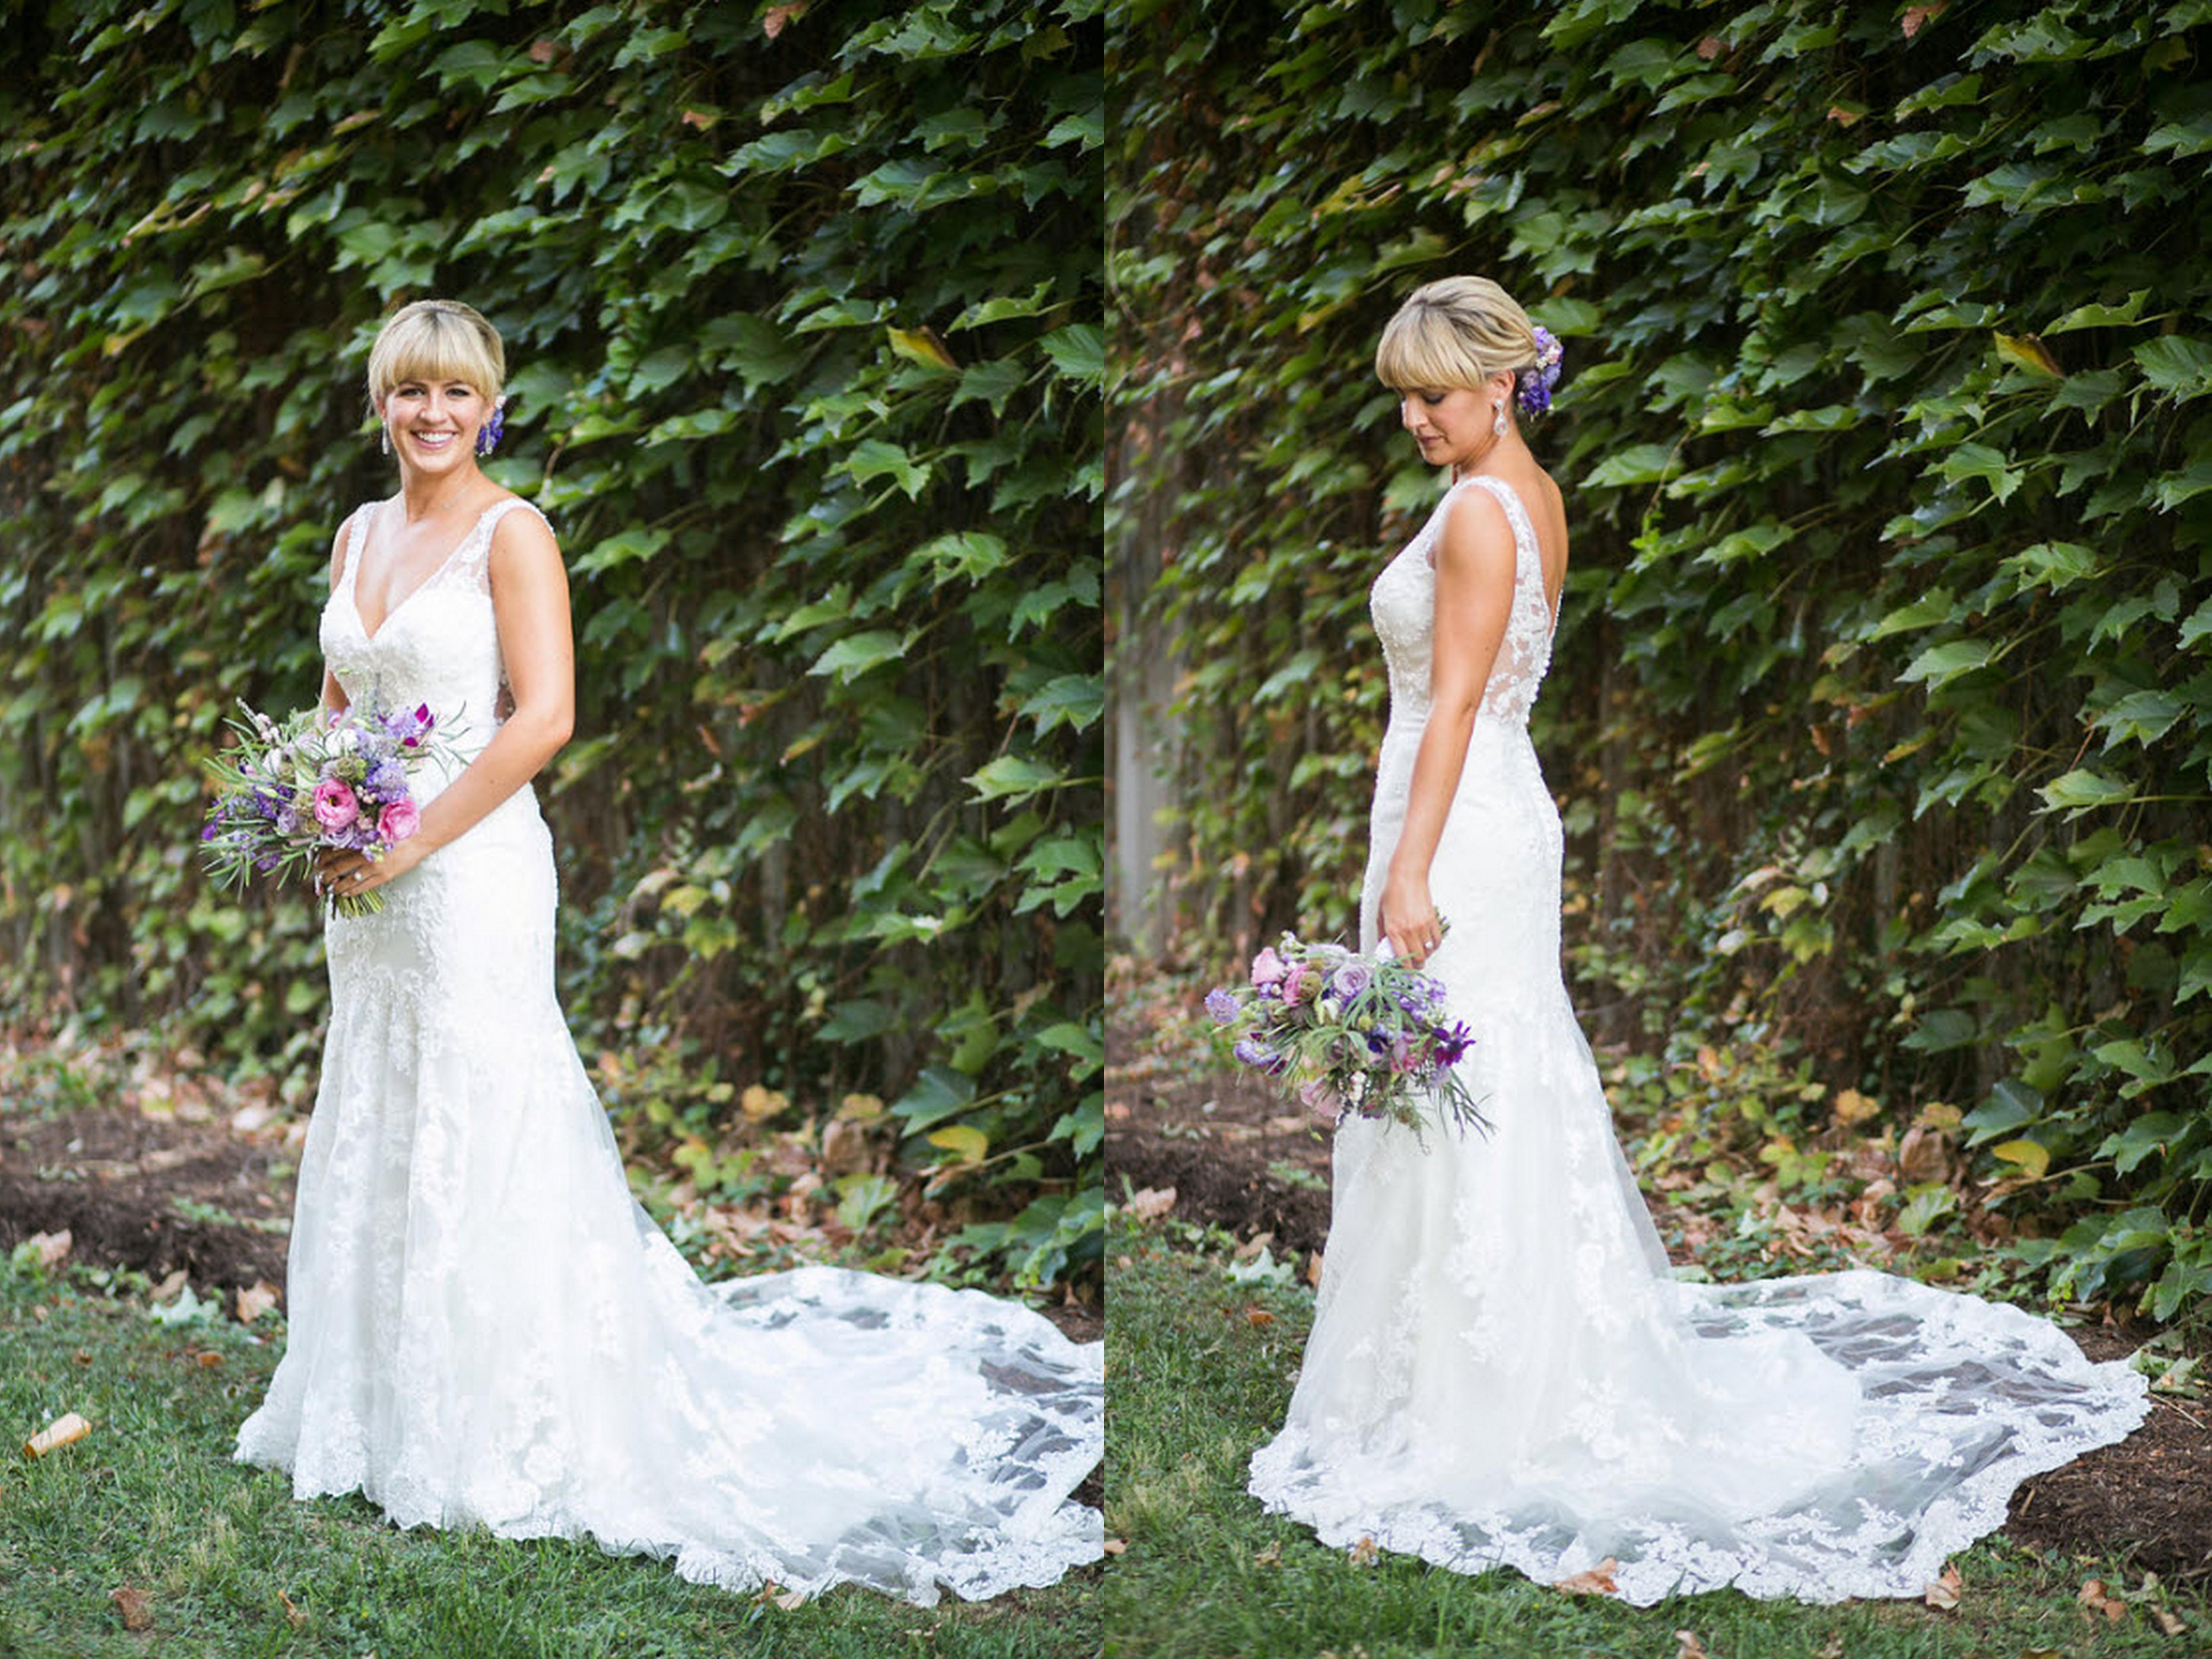 Wedding Gowns Dallas Fort Worth - Wedding Guest Dresses